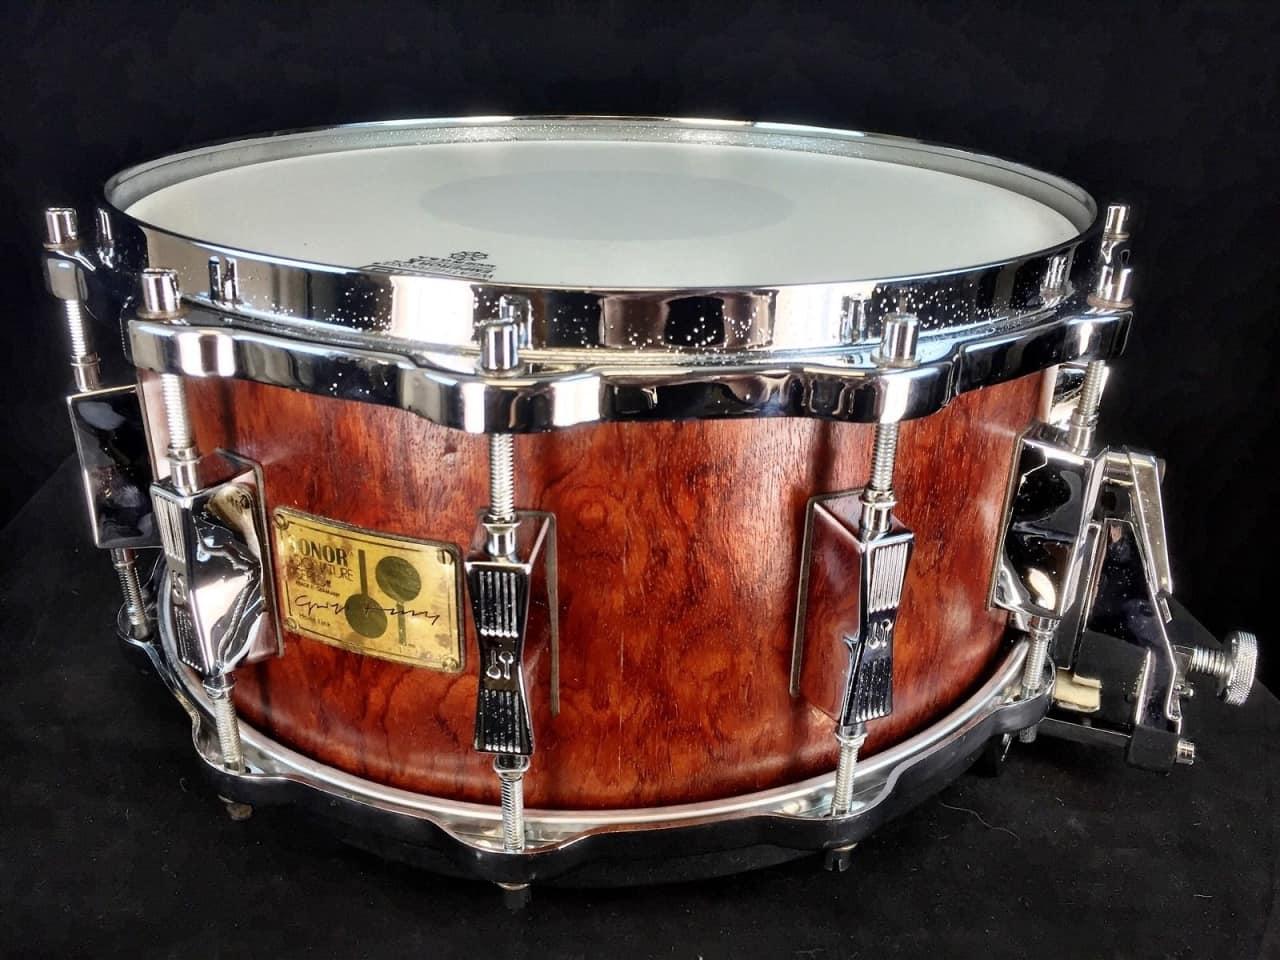 Sonor Signature Series Horst Link 6.5 x 14 Snare Drum